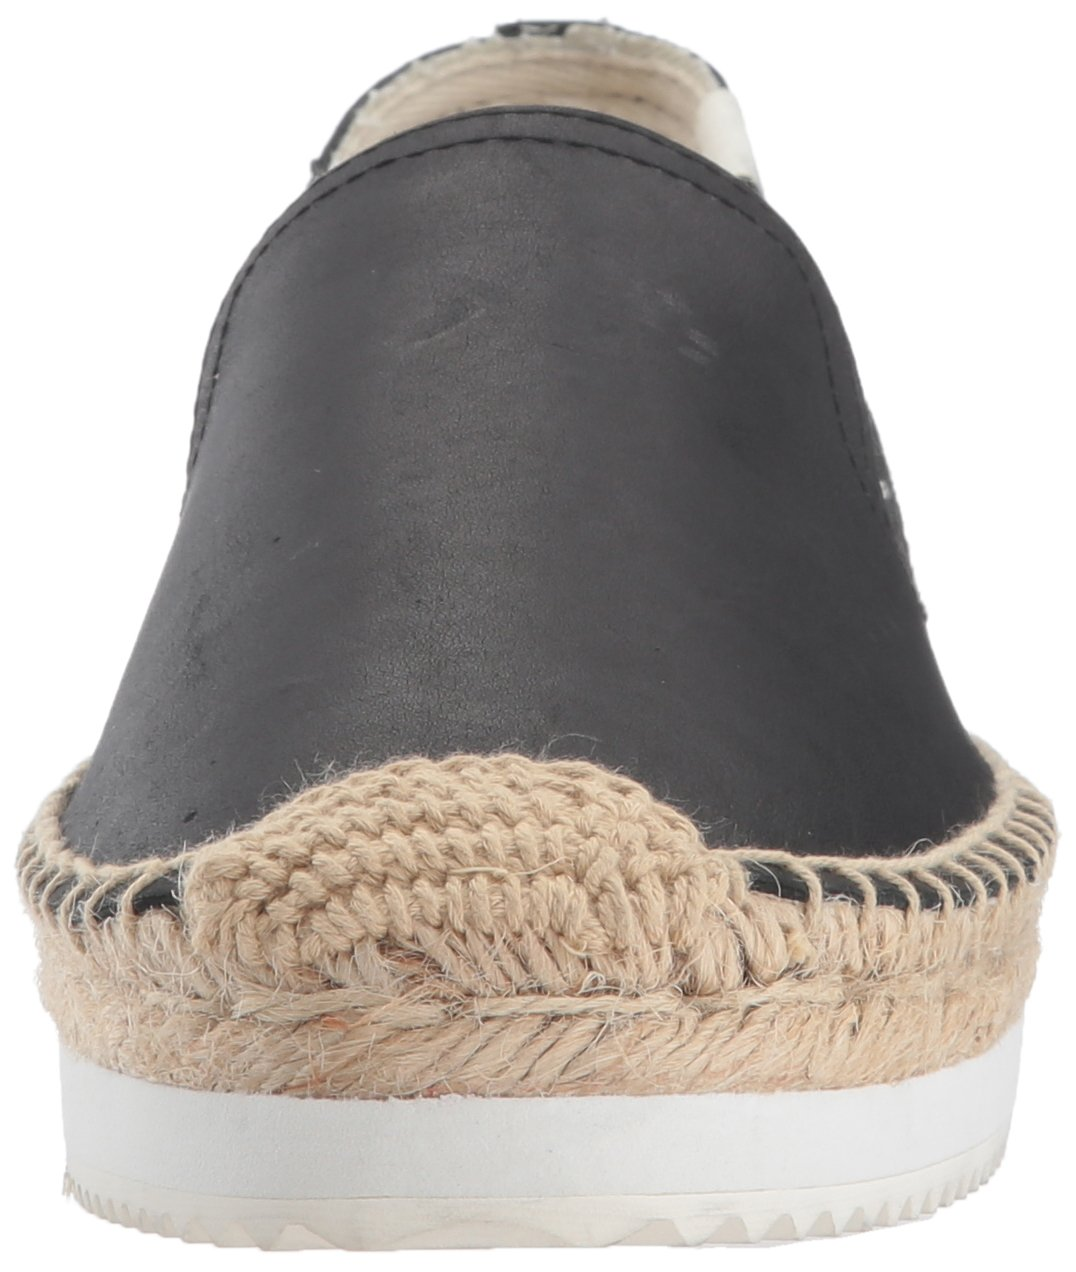 Soludos Women's MIX Sole Smkg Slipper Platform, Black, 8.5 B US by Soludos (Image #4)